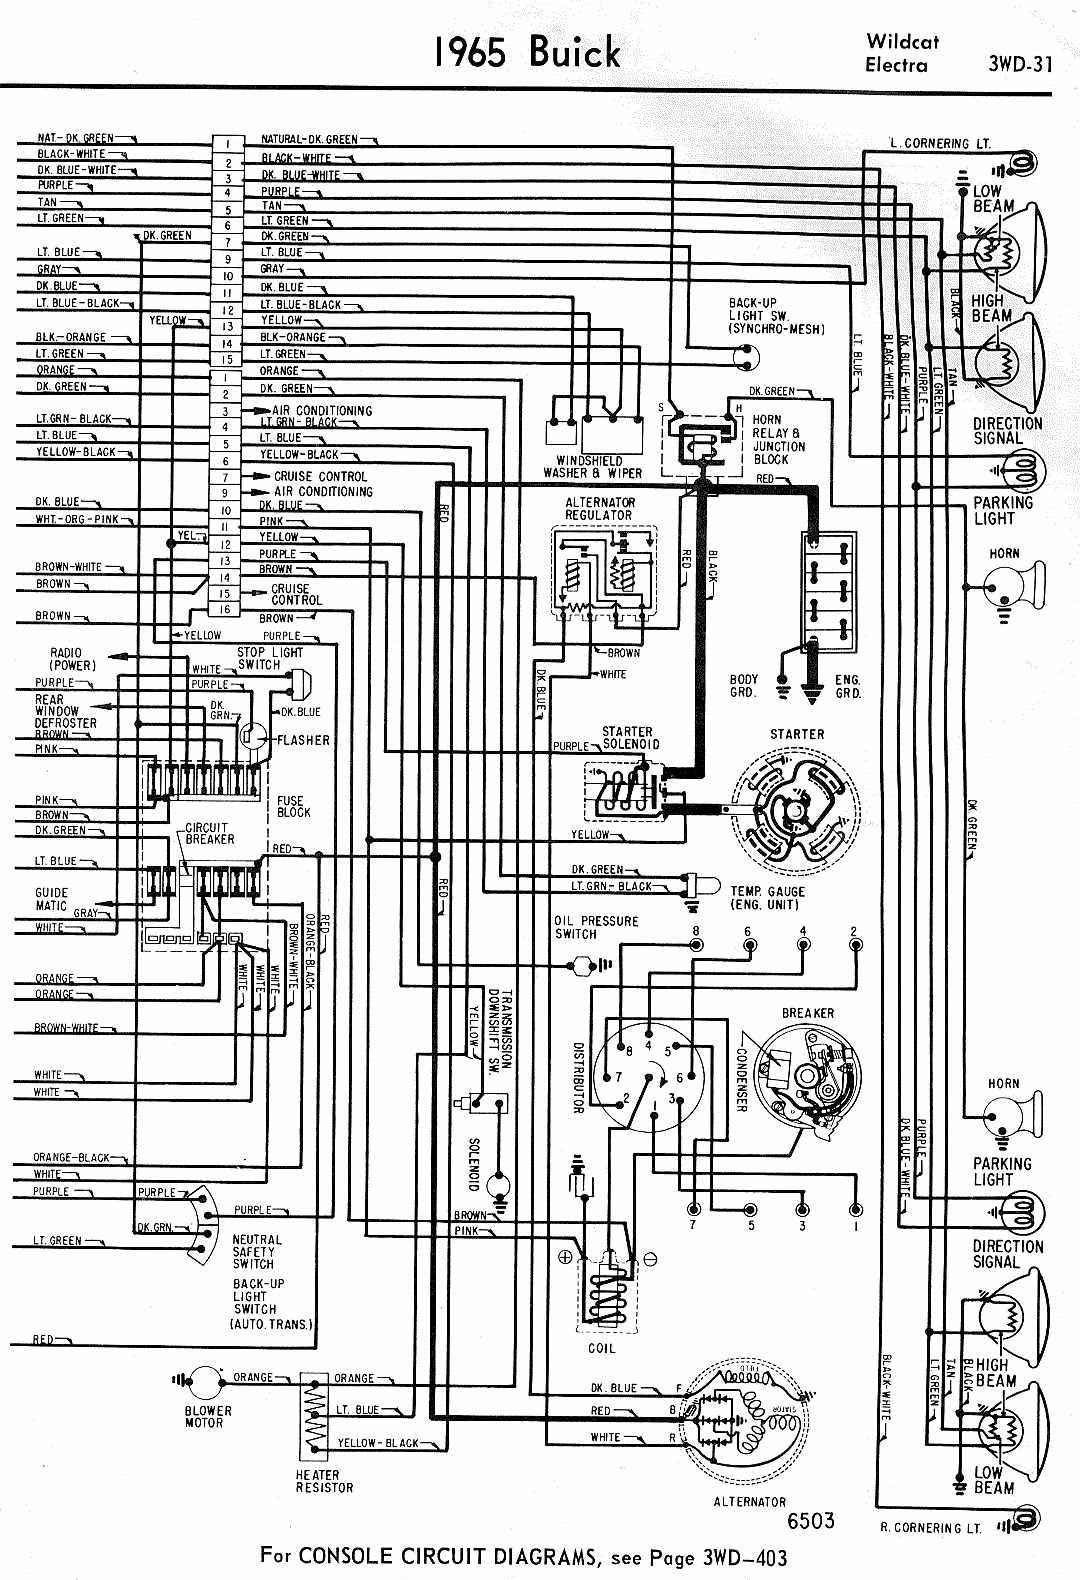 Funky 2004 525i Wiring Diagram Hvac Gallery - Electrical Diagram ...